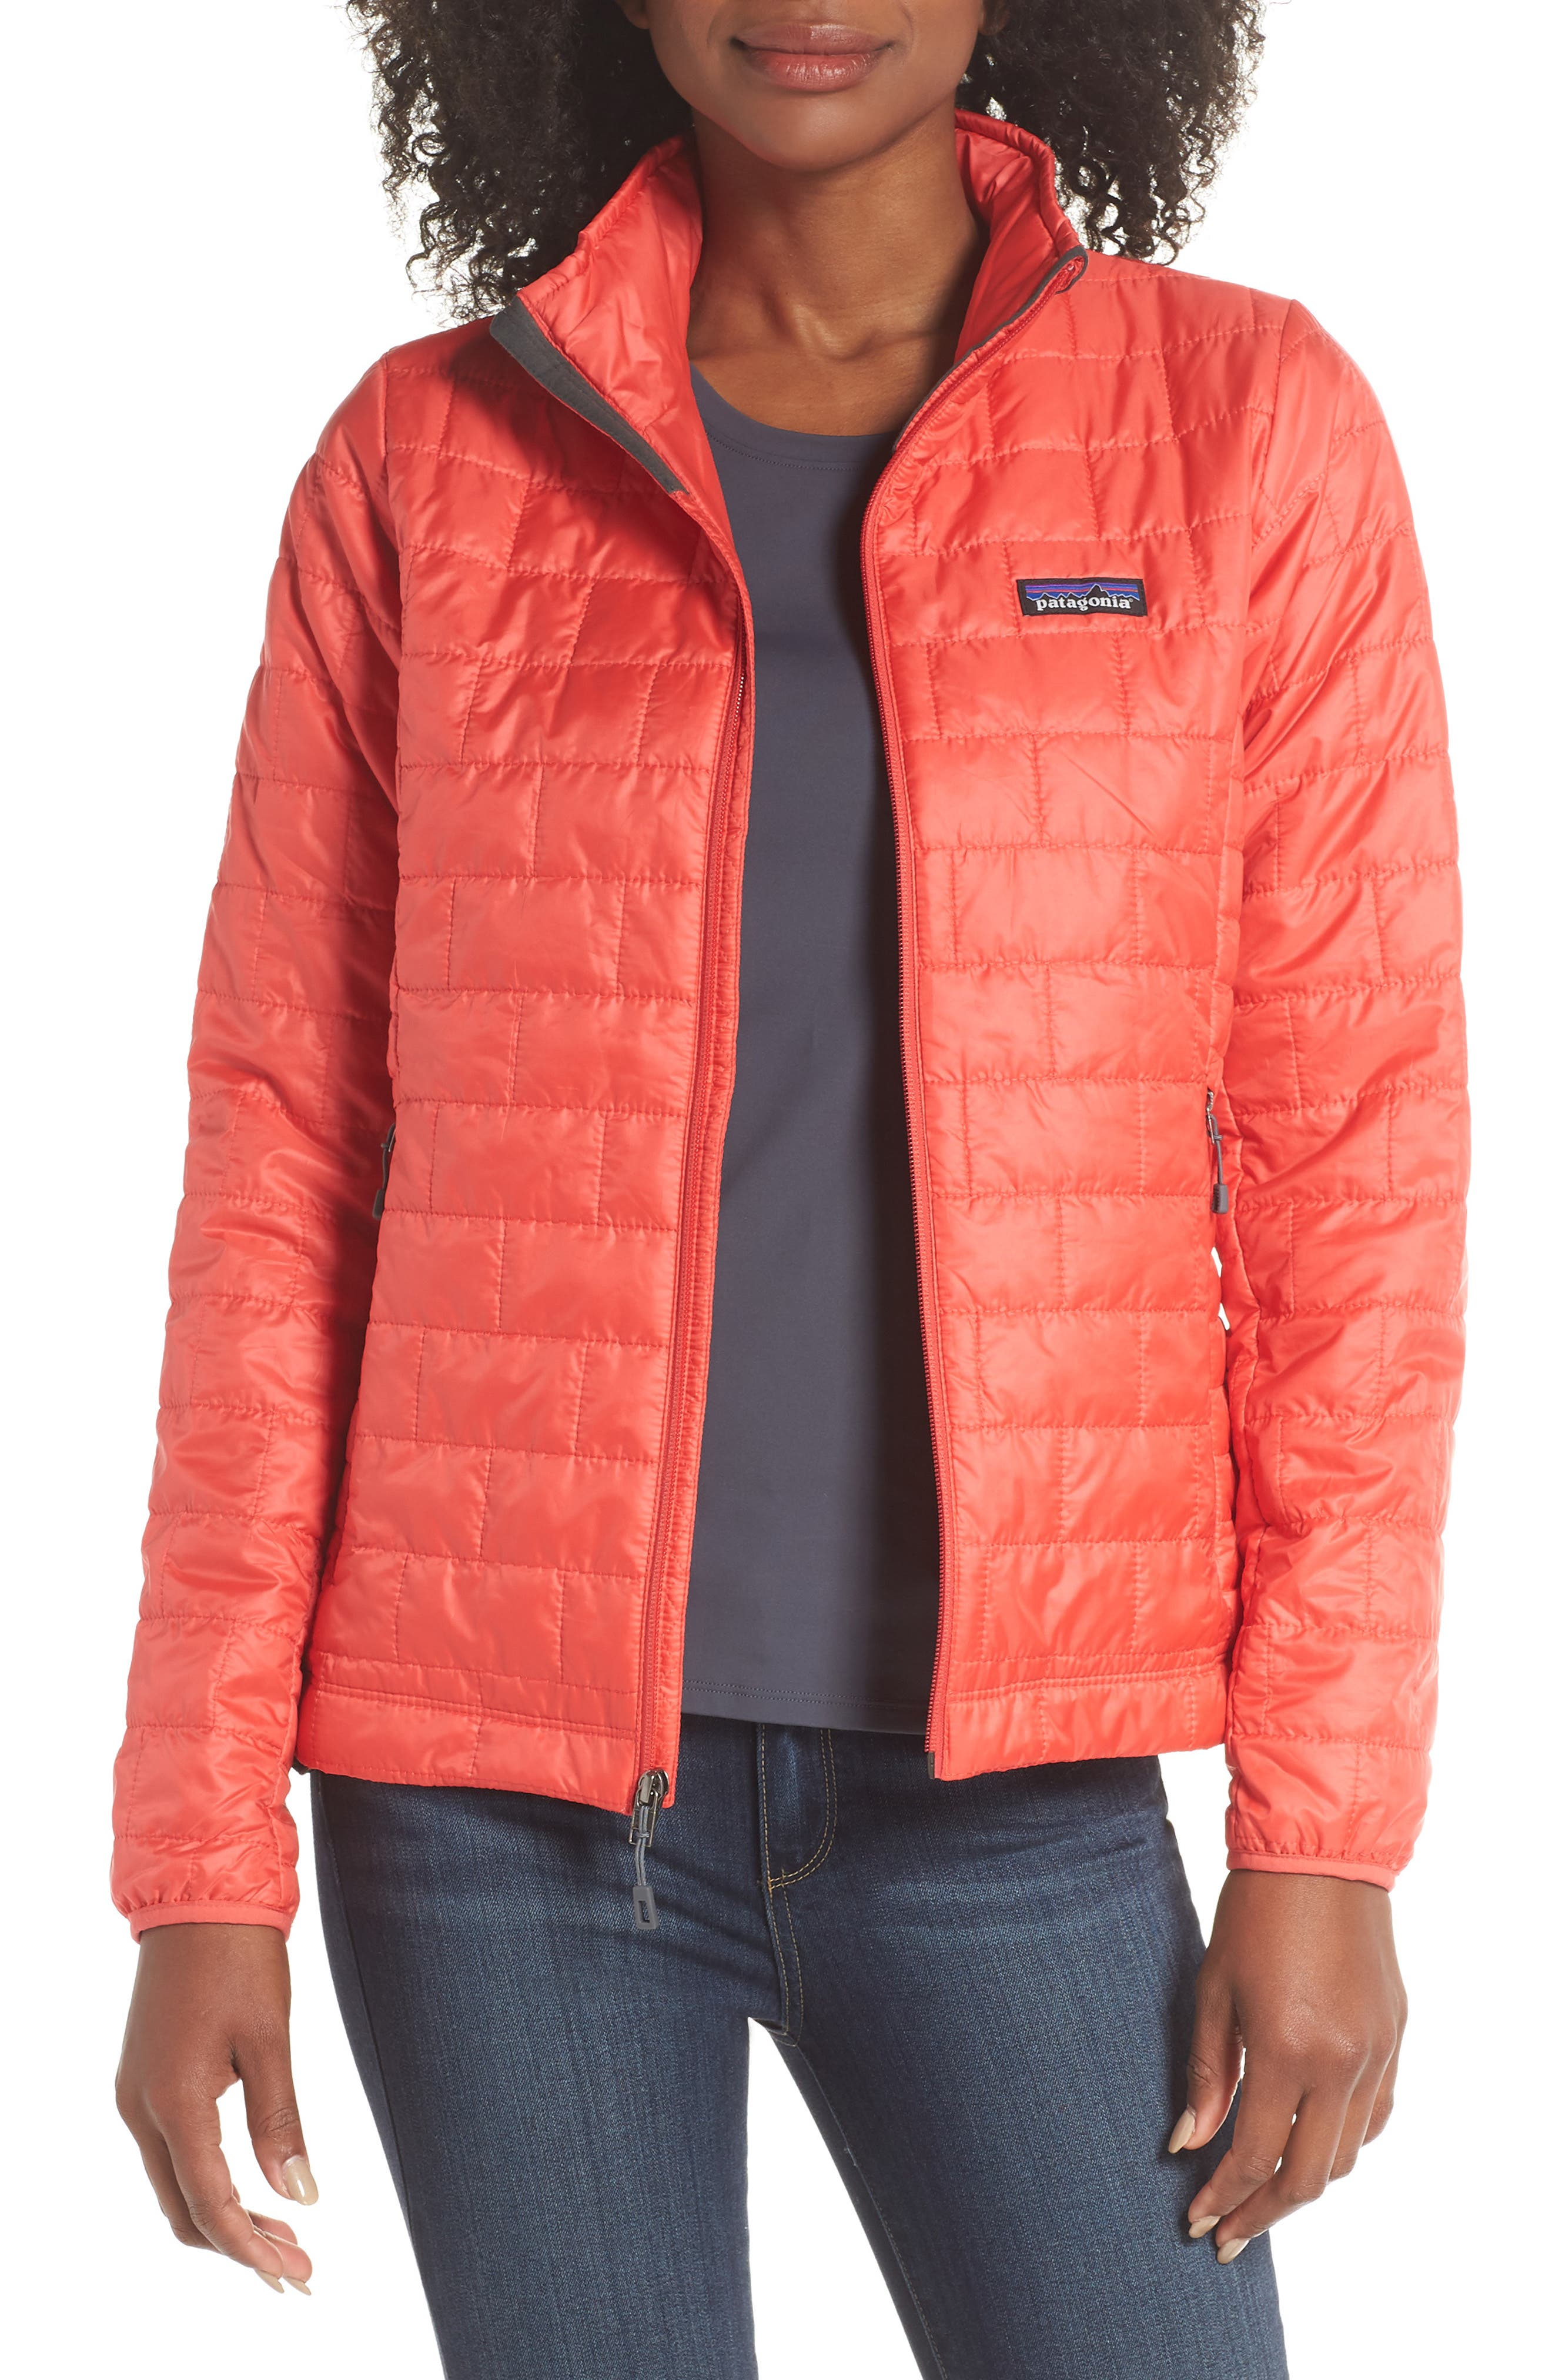 Nano Puff<sup>®</sup> Water Resistant Jacket,                             Main thumbnail 1, color,                             TOMATO